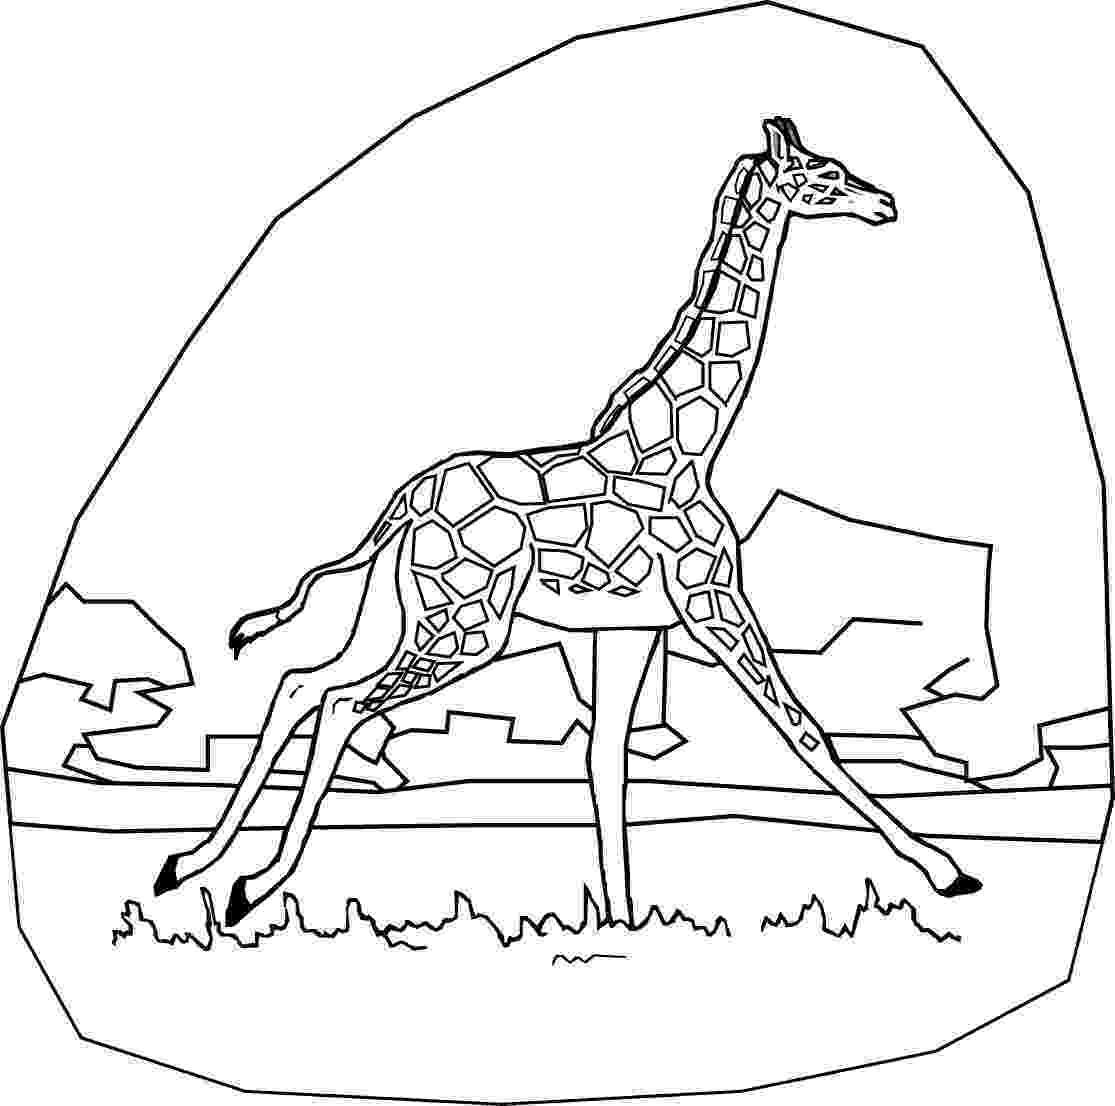 coloring page giraffe kids n funcom 45 coloring pages of giraffe coloring page giraffe 1 1